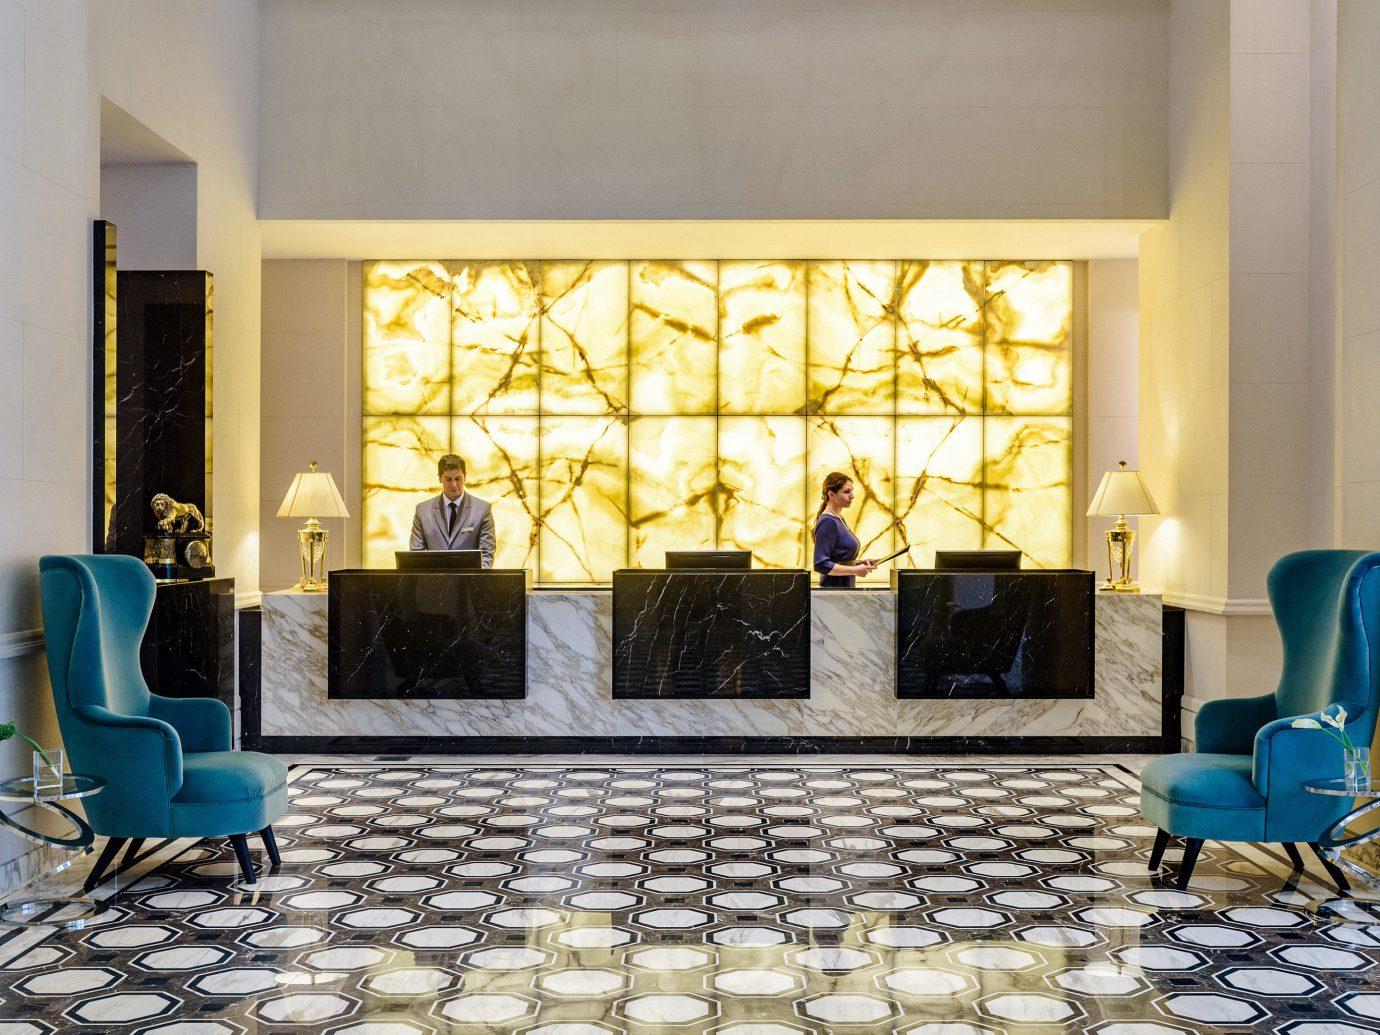 Boutique Hotels Luxury Travel indoor wall Living interior design Lobby room window living room furniture flooring table floor area